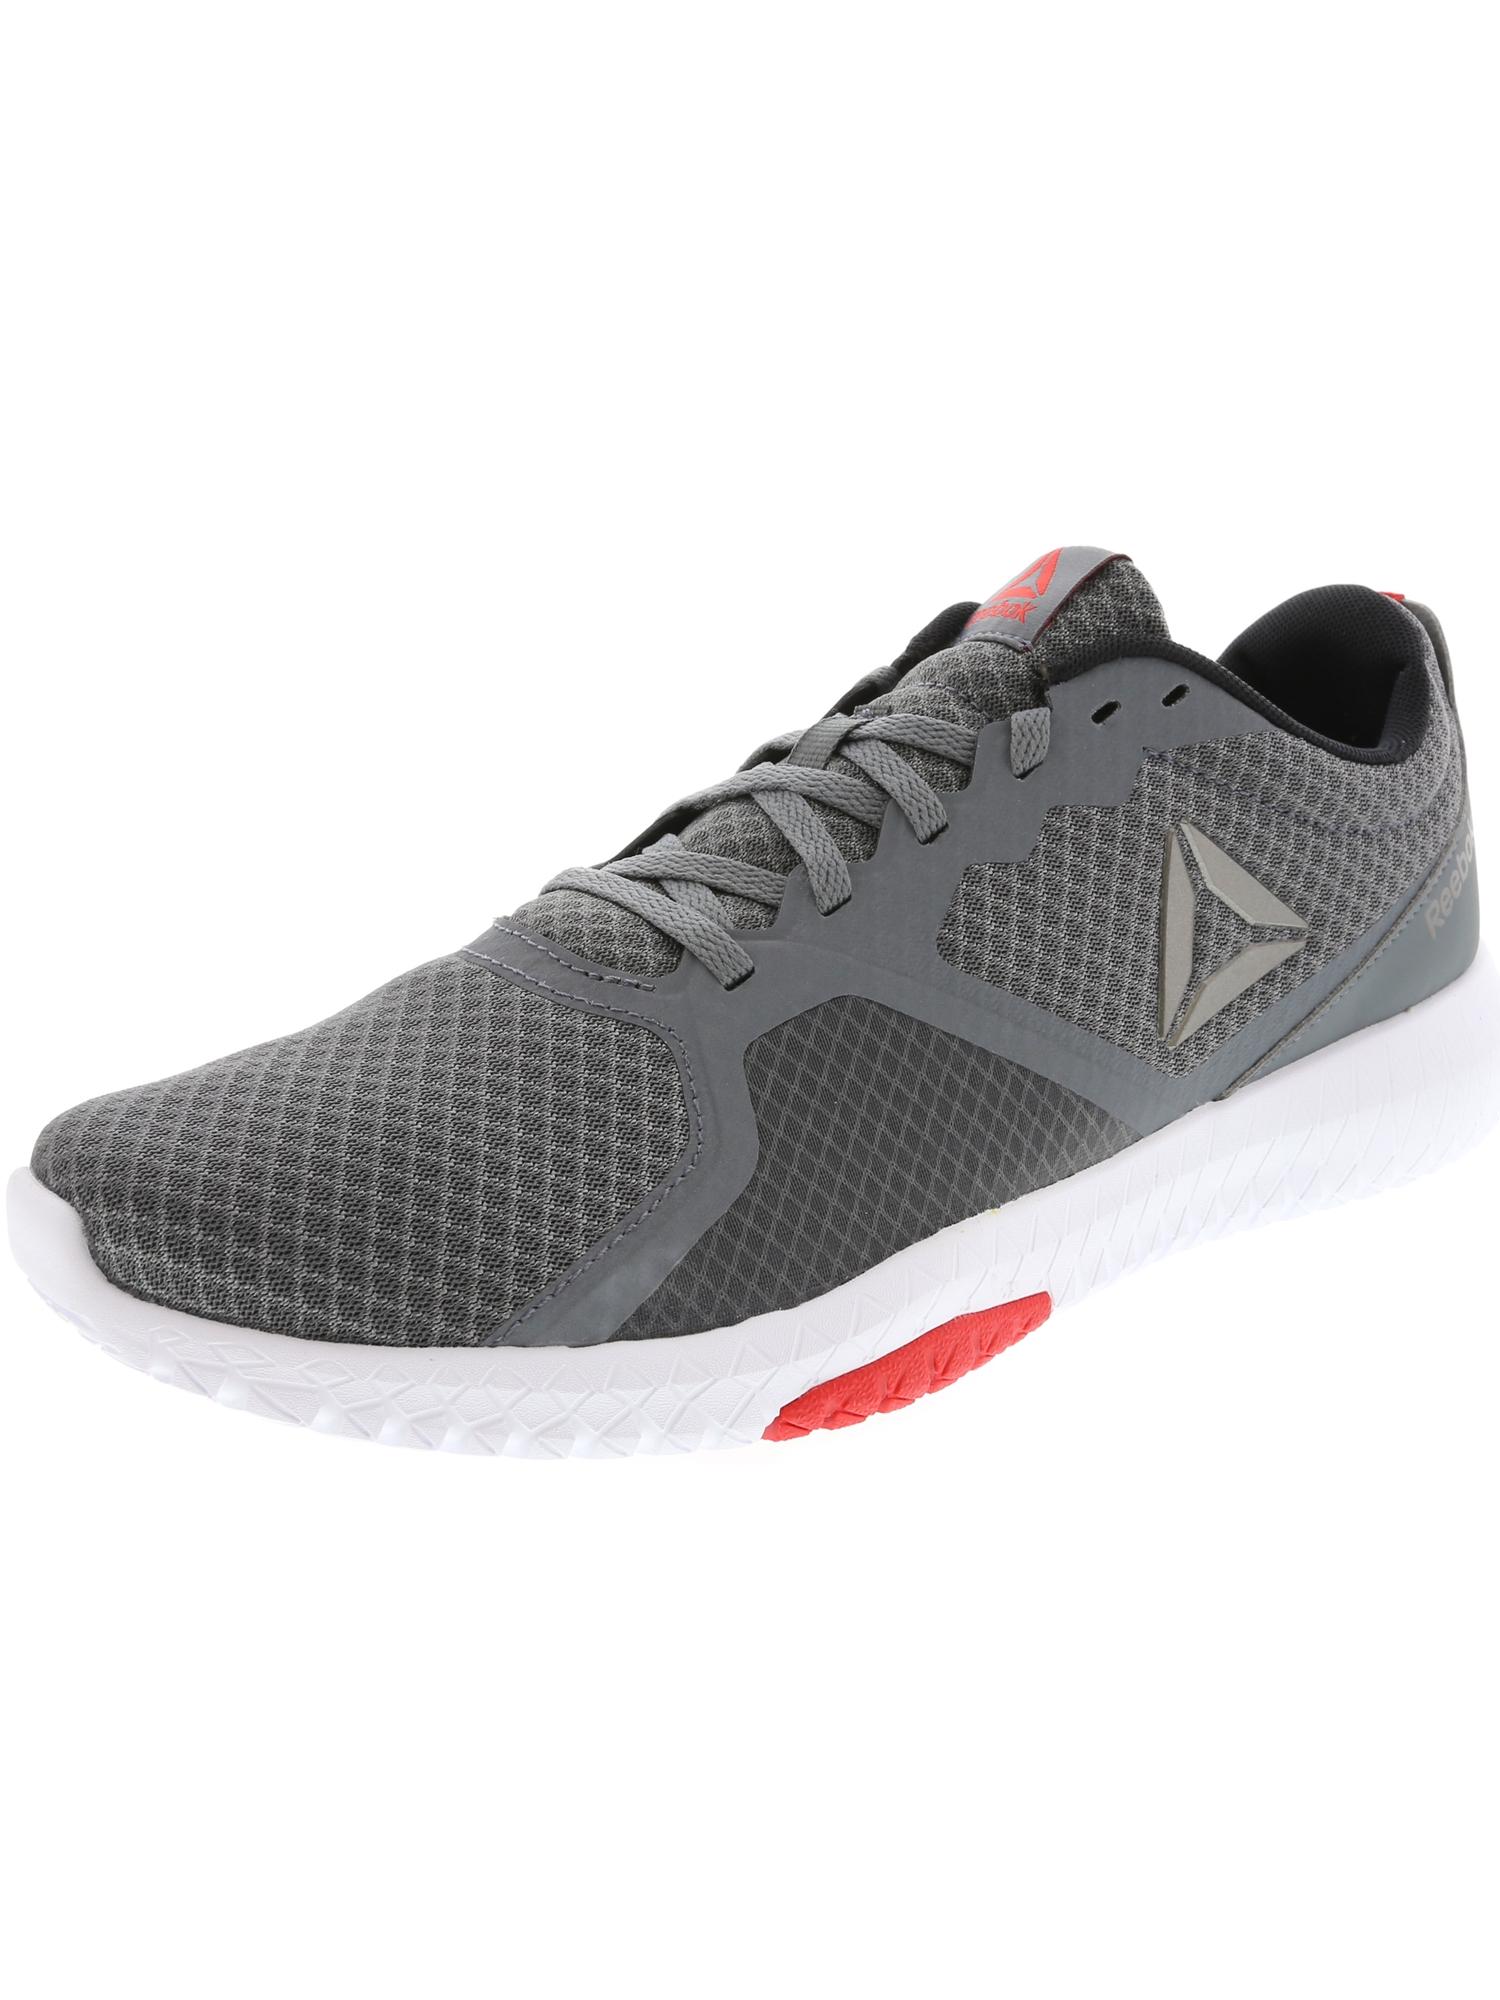 Reebok Men's Flexagon Force Cross Trainer Shoes (Alloy/White/Primal Red/Pewter/Black 1)